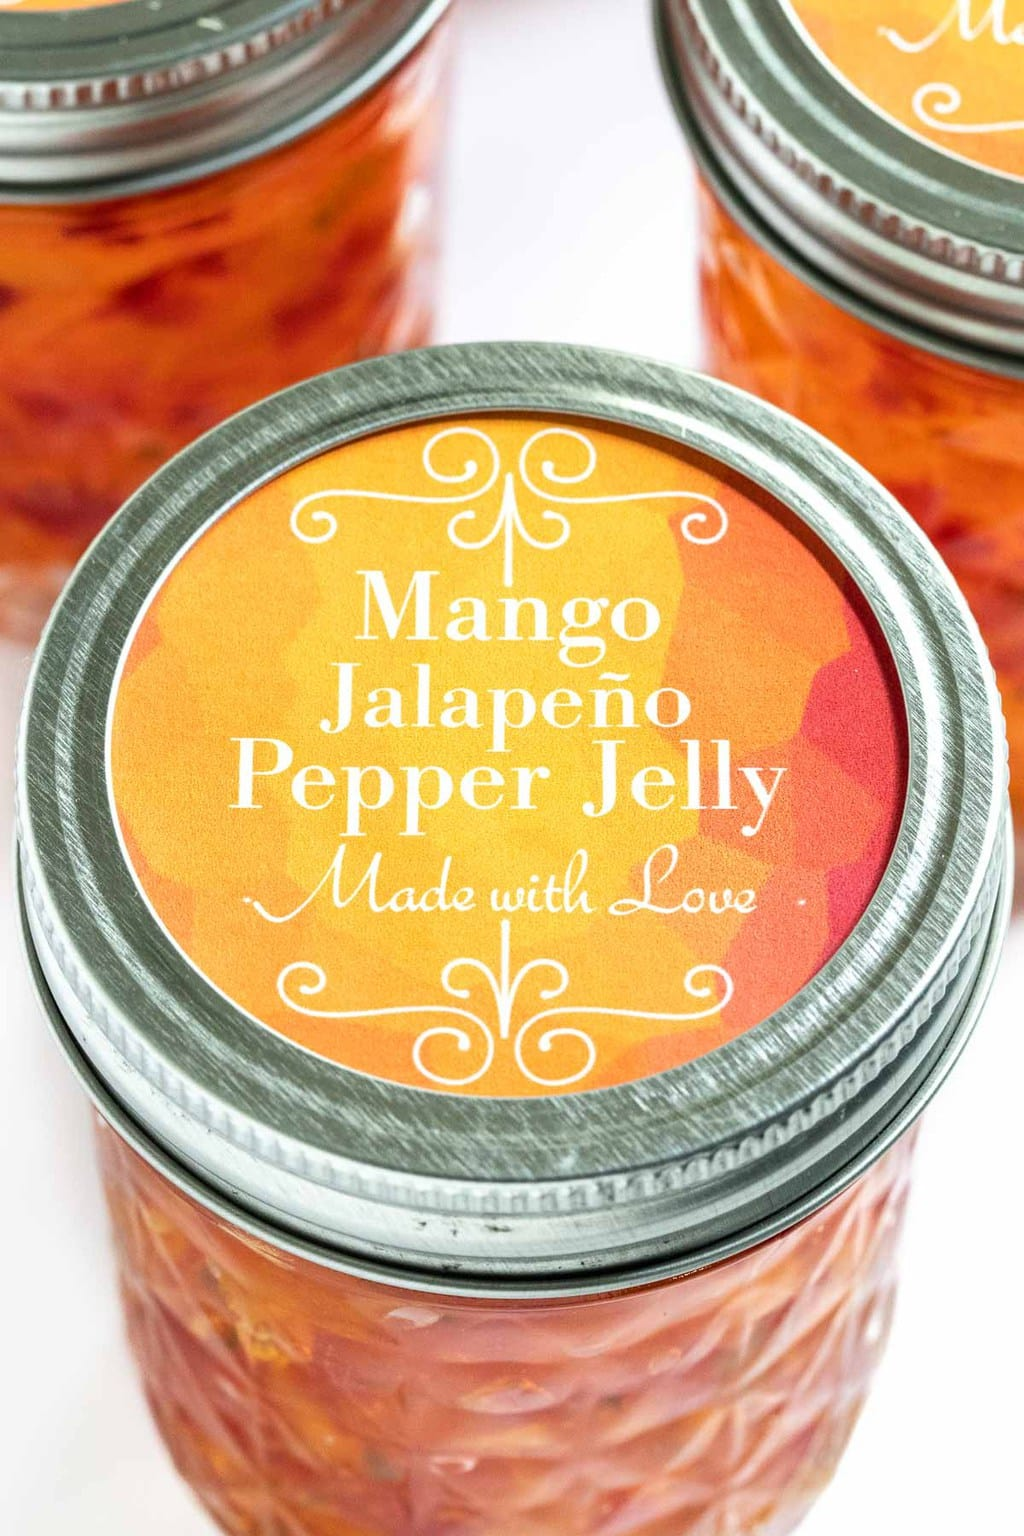 Ultra closeup photo of the cap label on a jar of Mango Jalapeño Pepper Jelly.